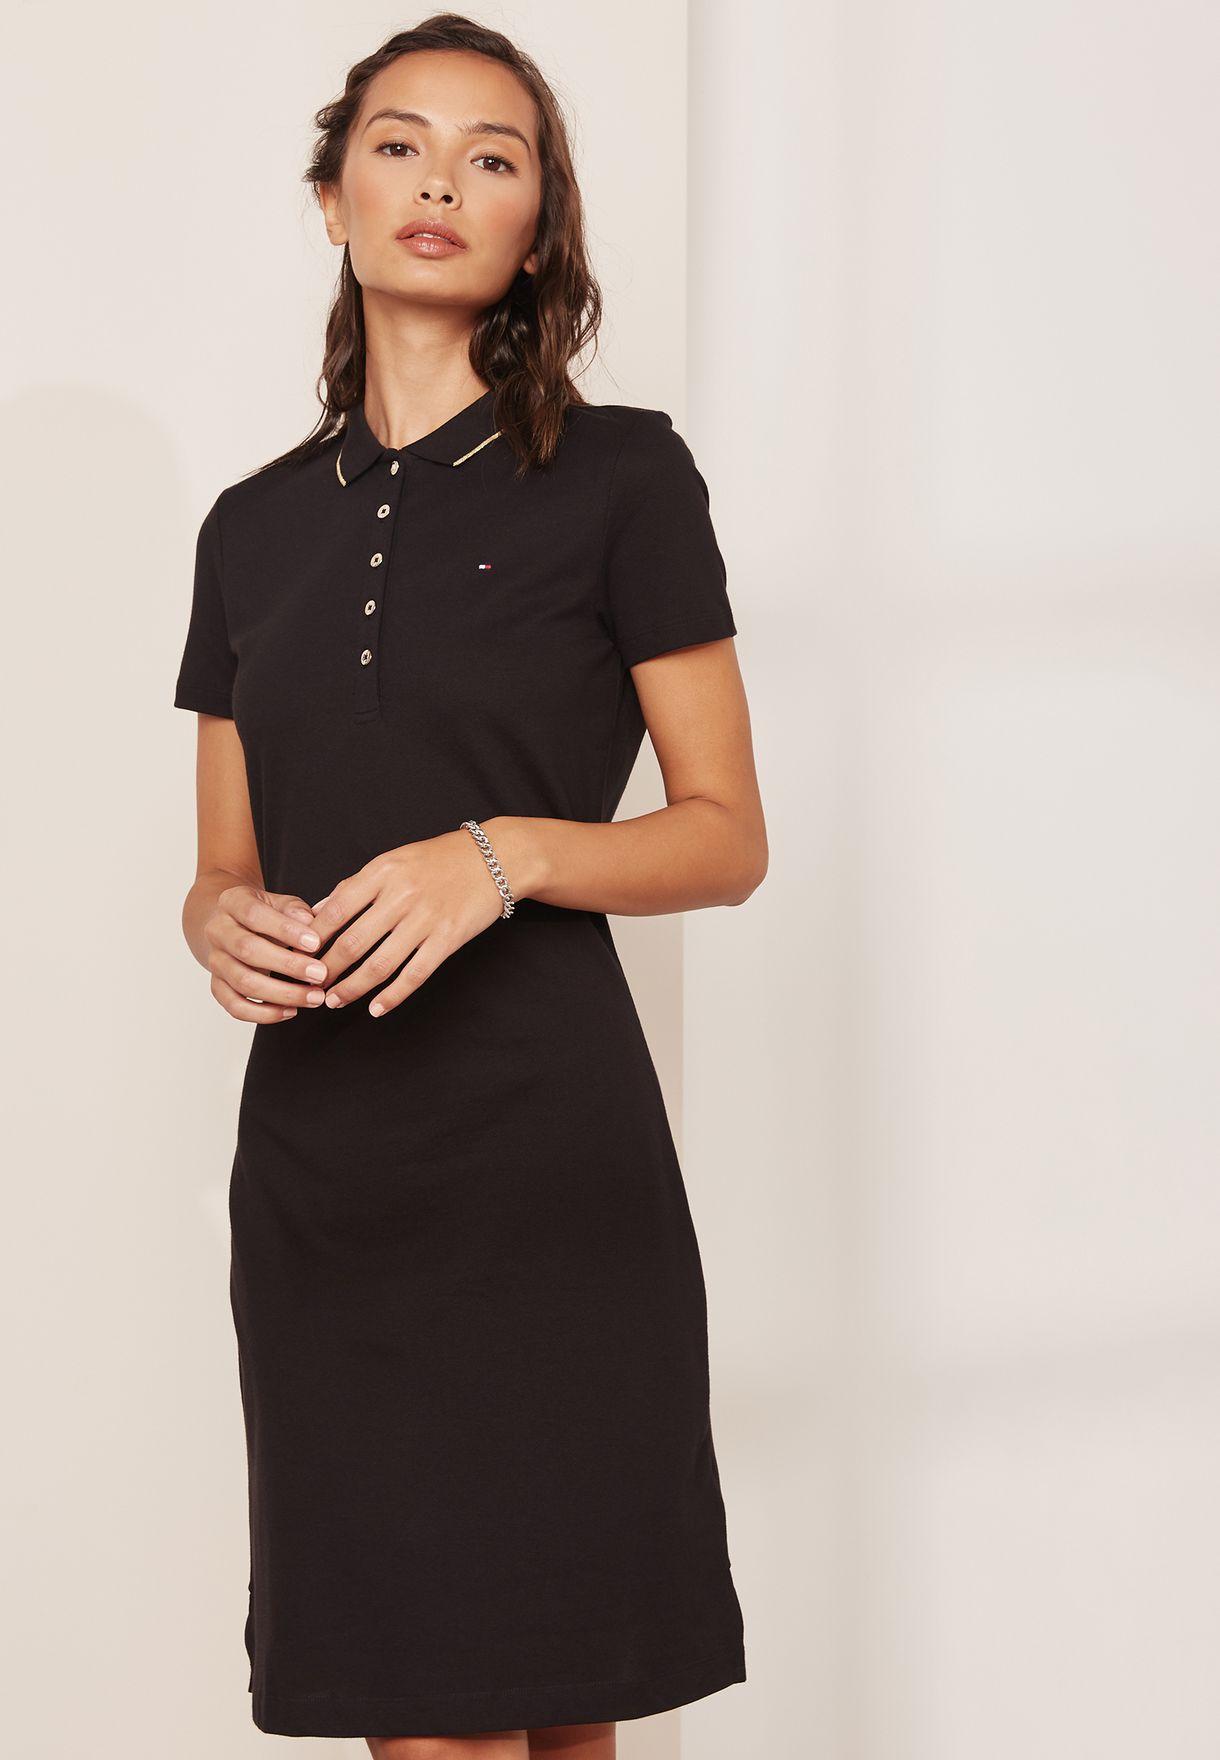 04574a817499 Shop Tommy Hilfiger black Chiara Polo Dress 1M87640146 for Women in ...